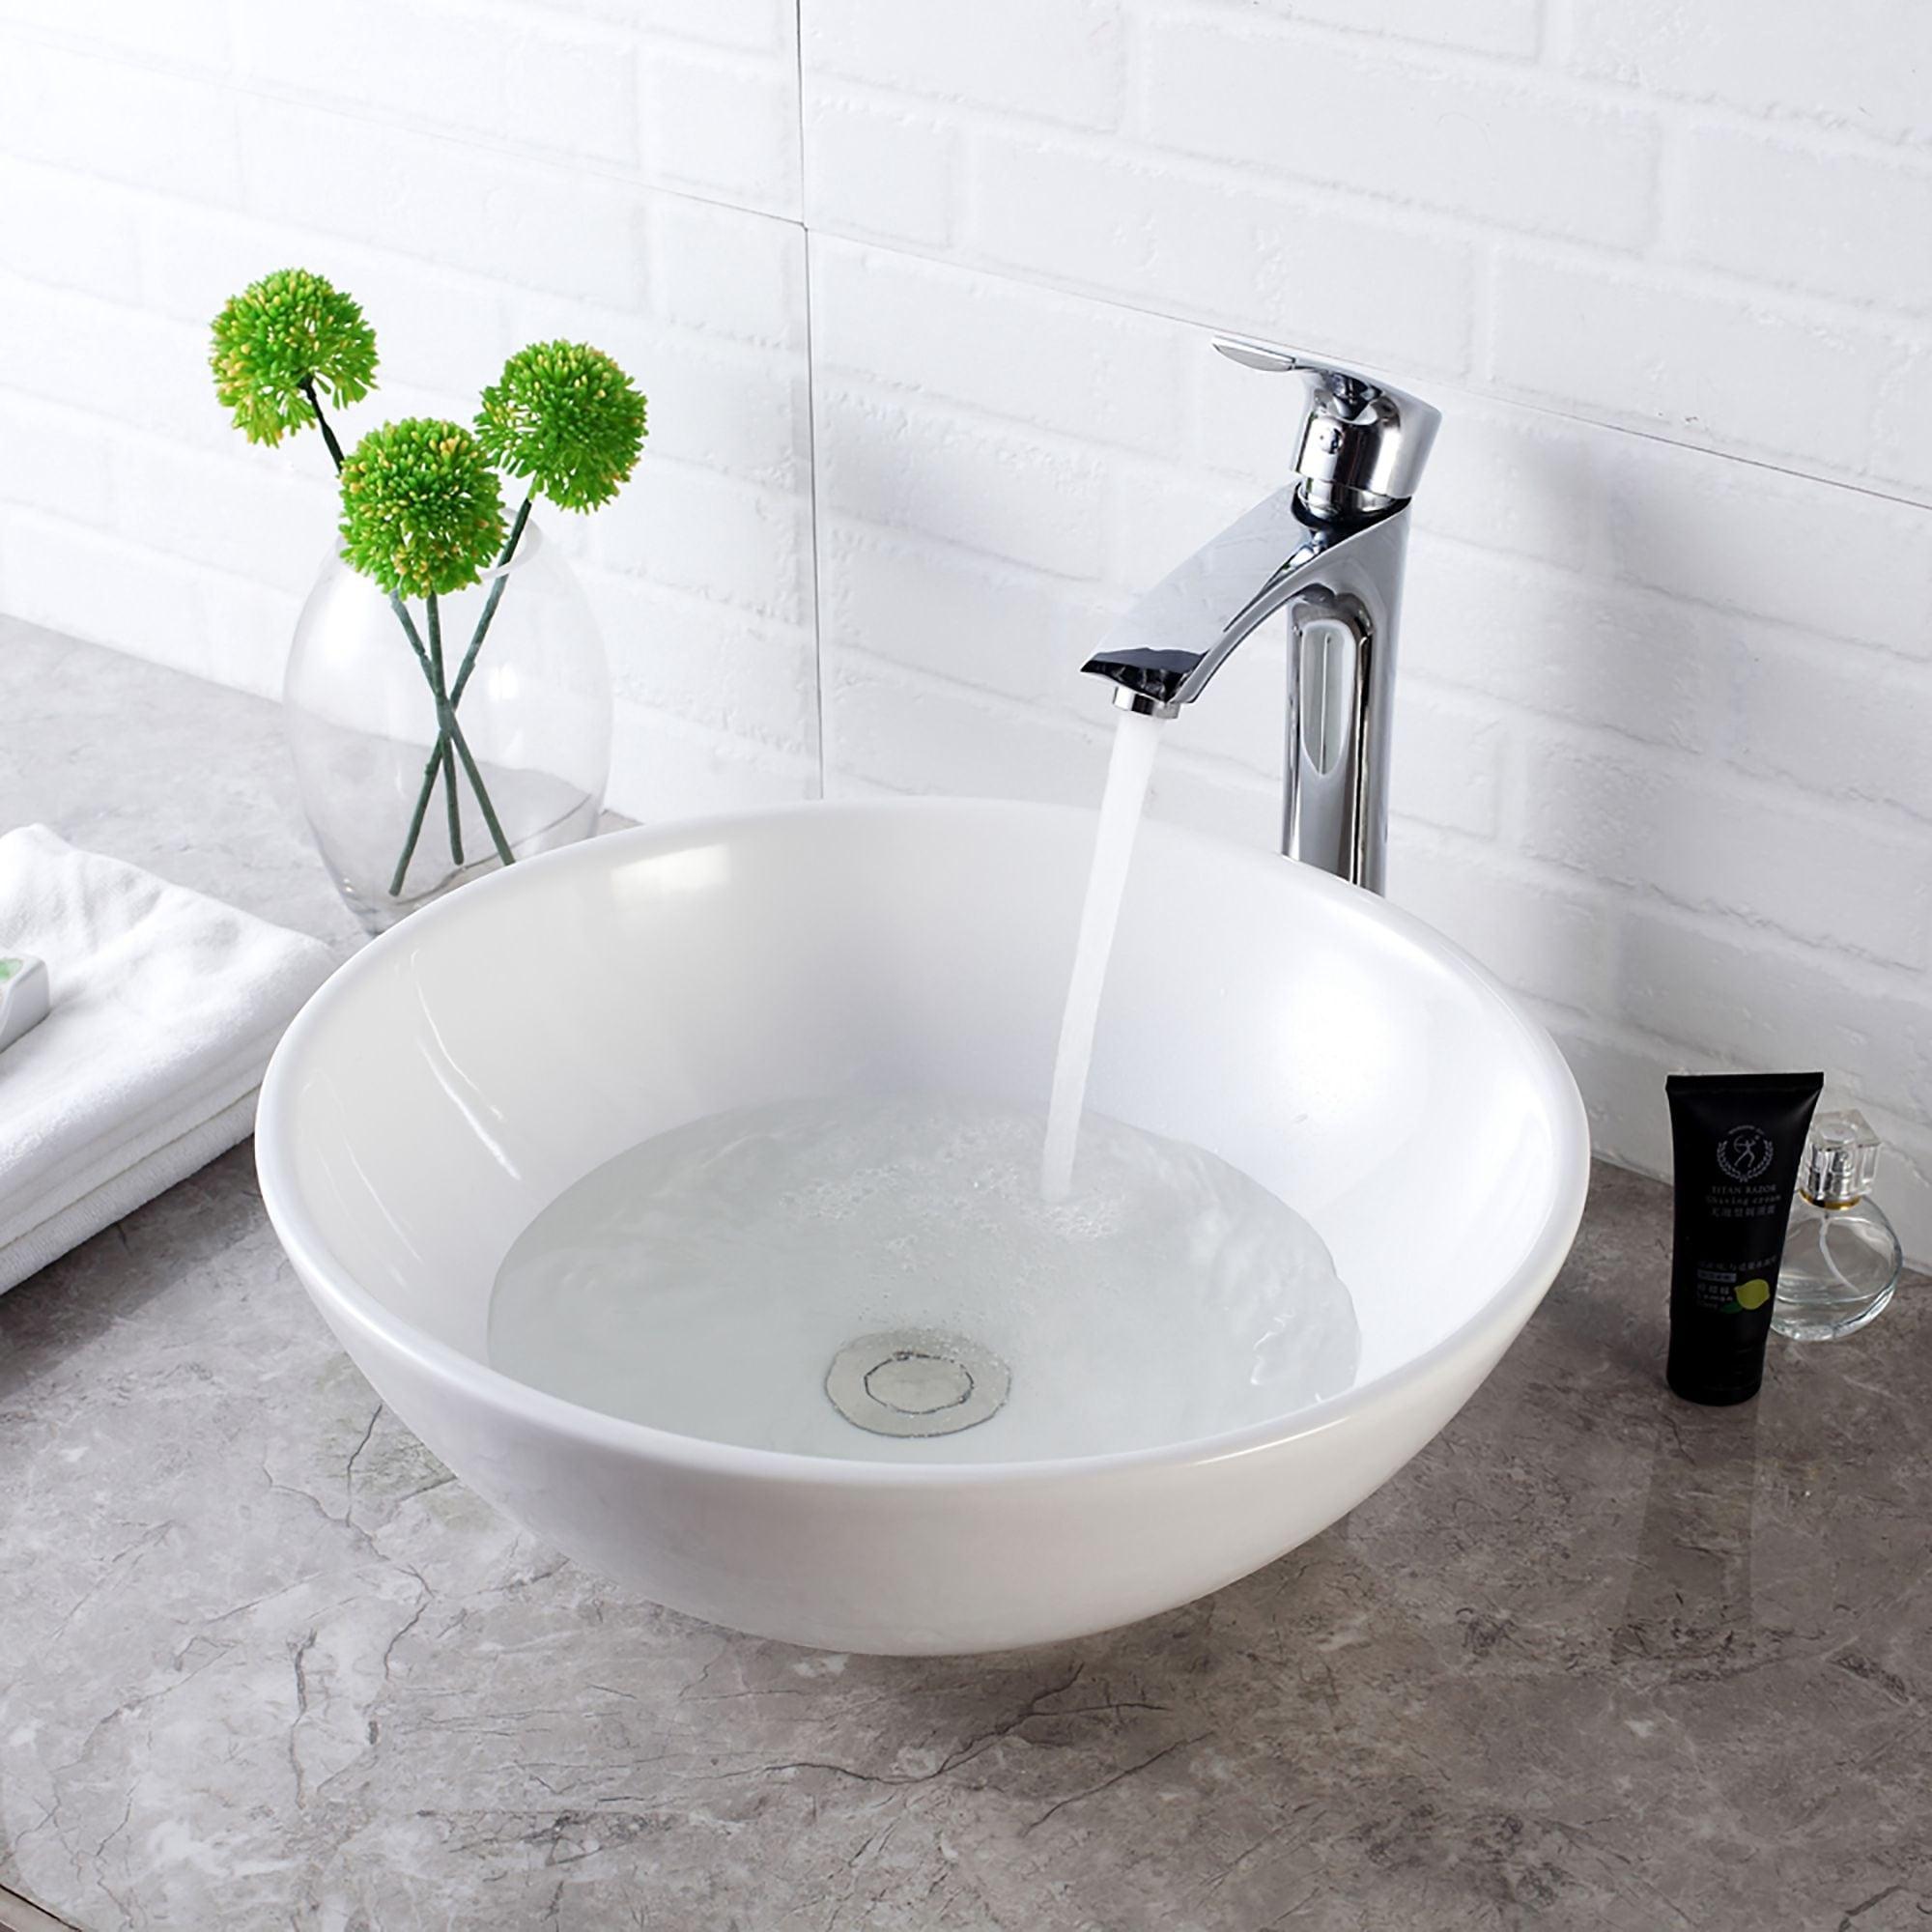 White Ceramic Oval Vessel Bathroom Sink Overstock 31636730